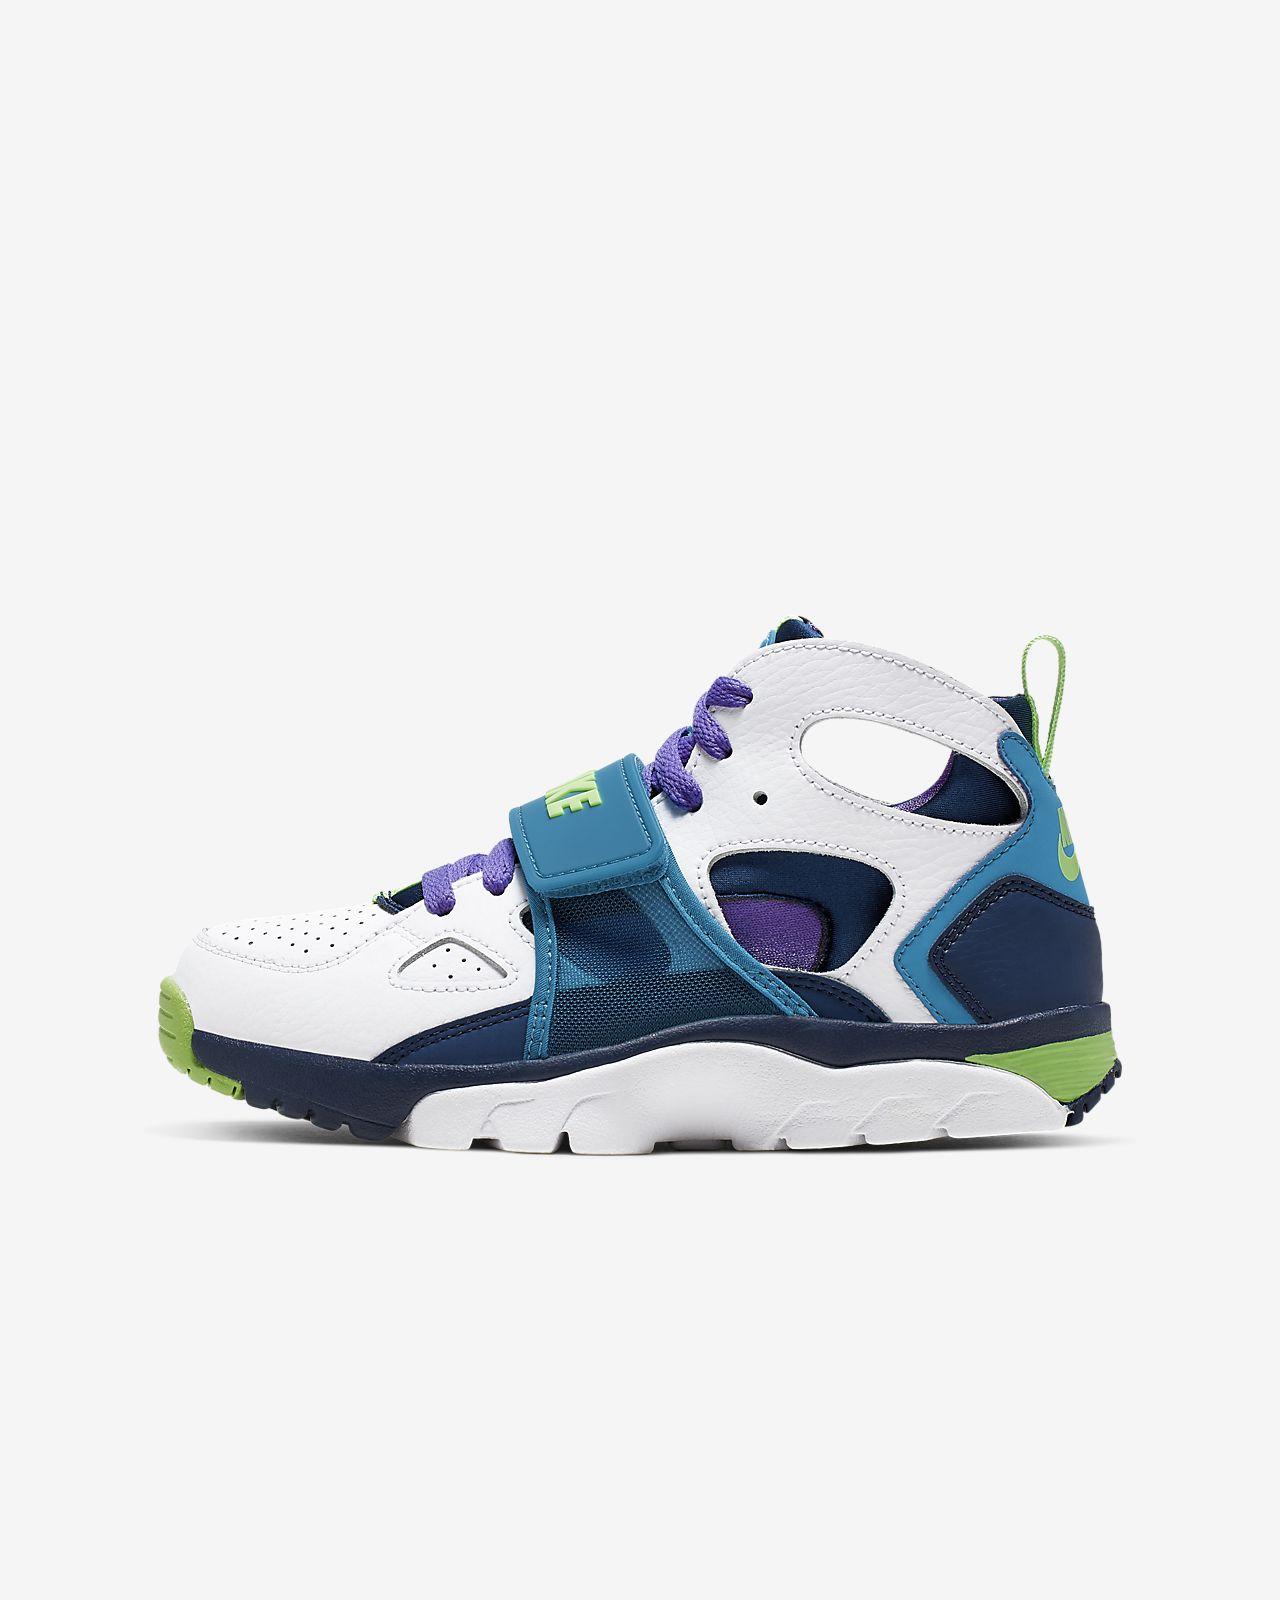 the latest 792cb d81ca ... Nike Trainer Huarache Big Kids  Shoe